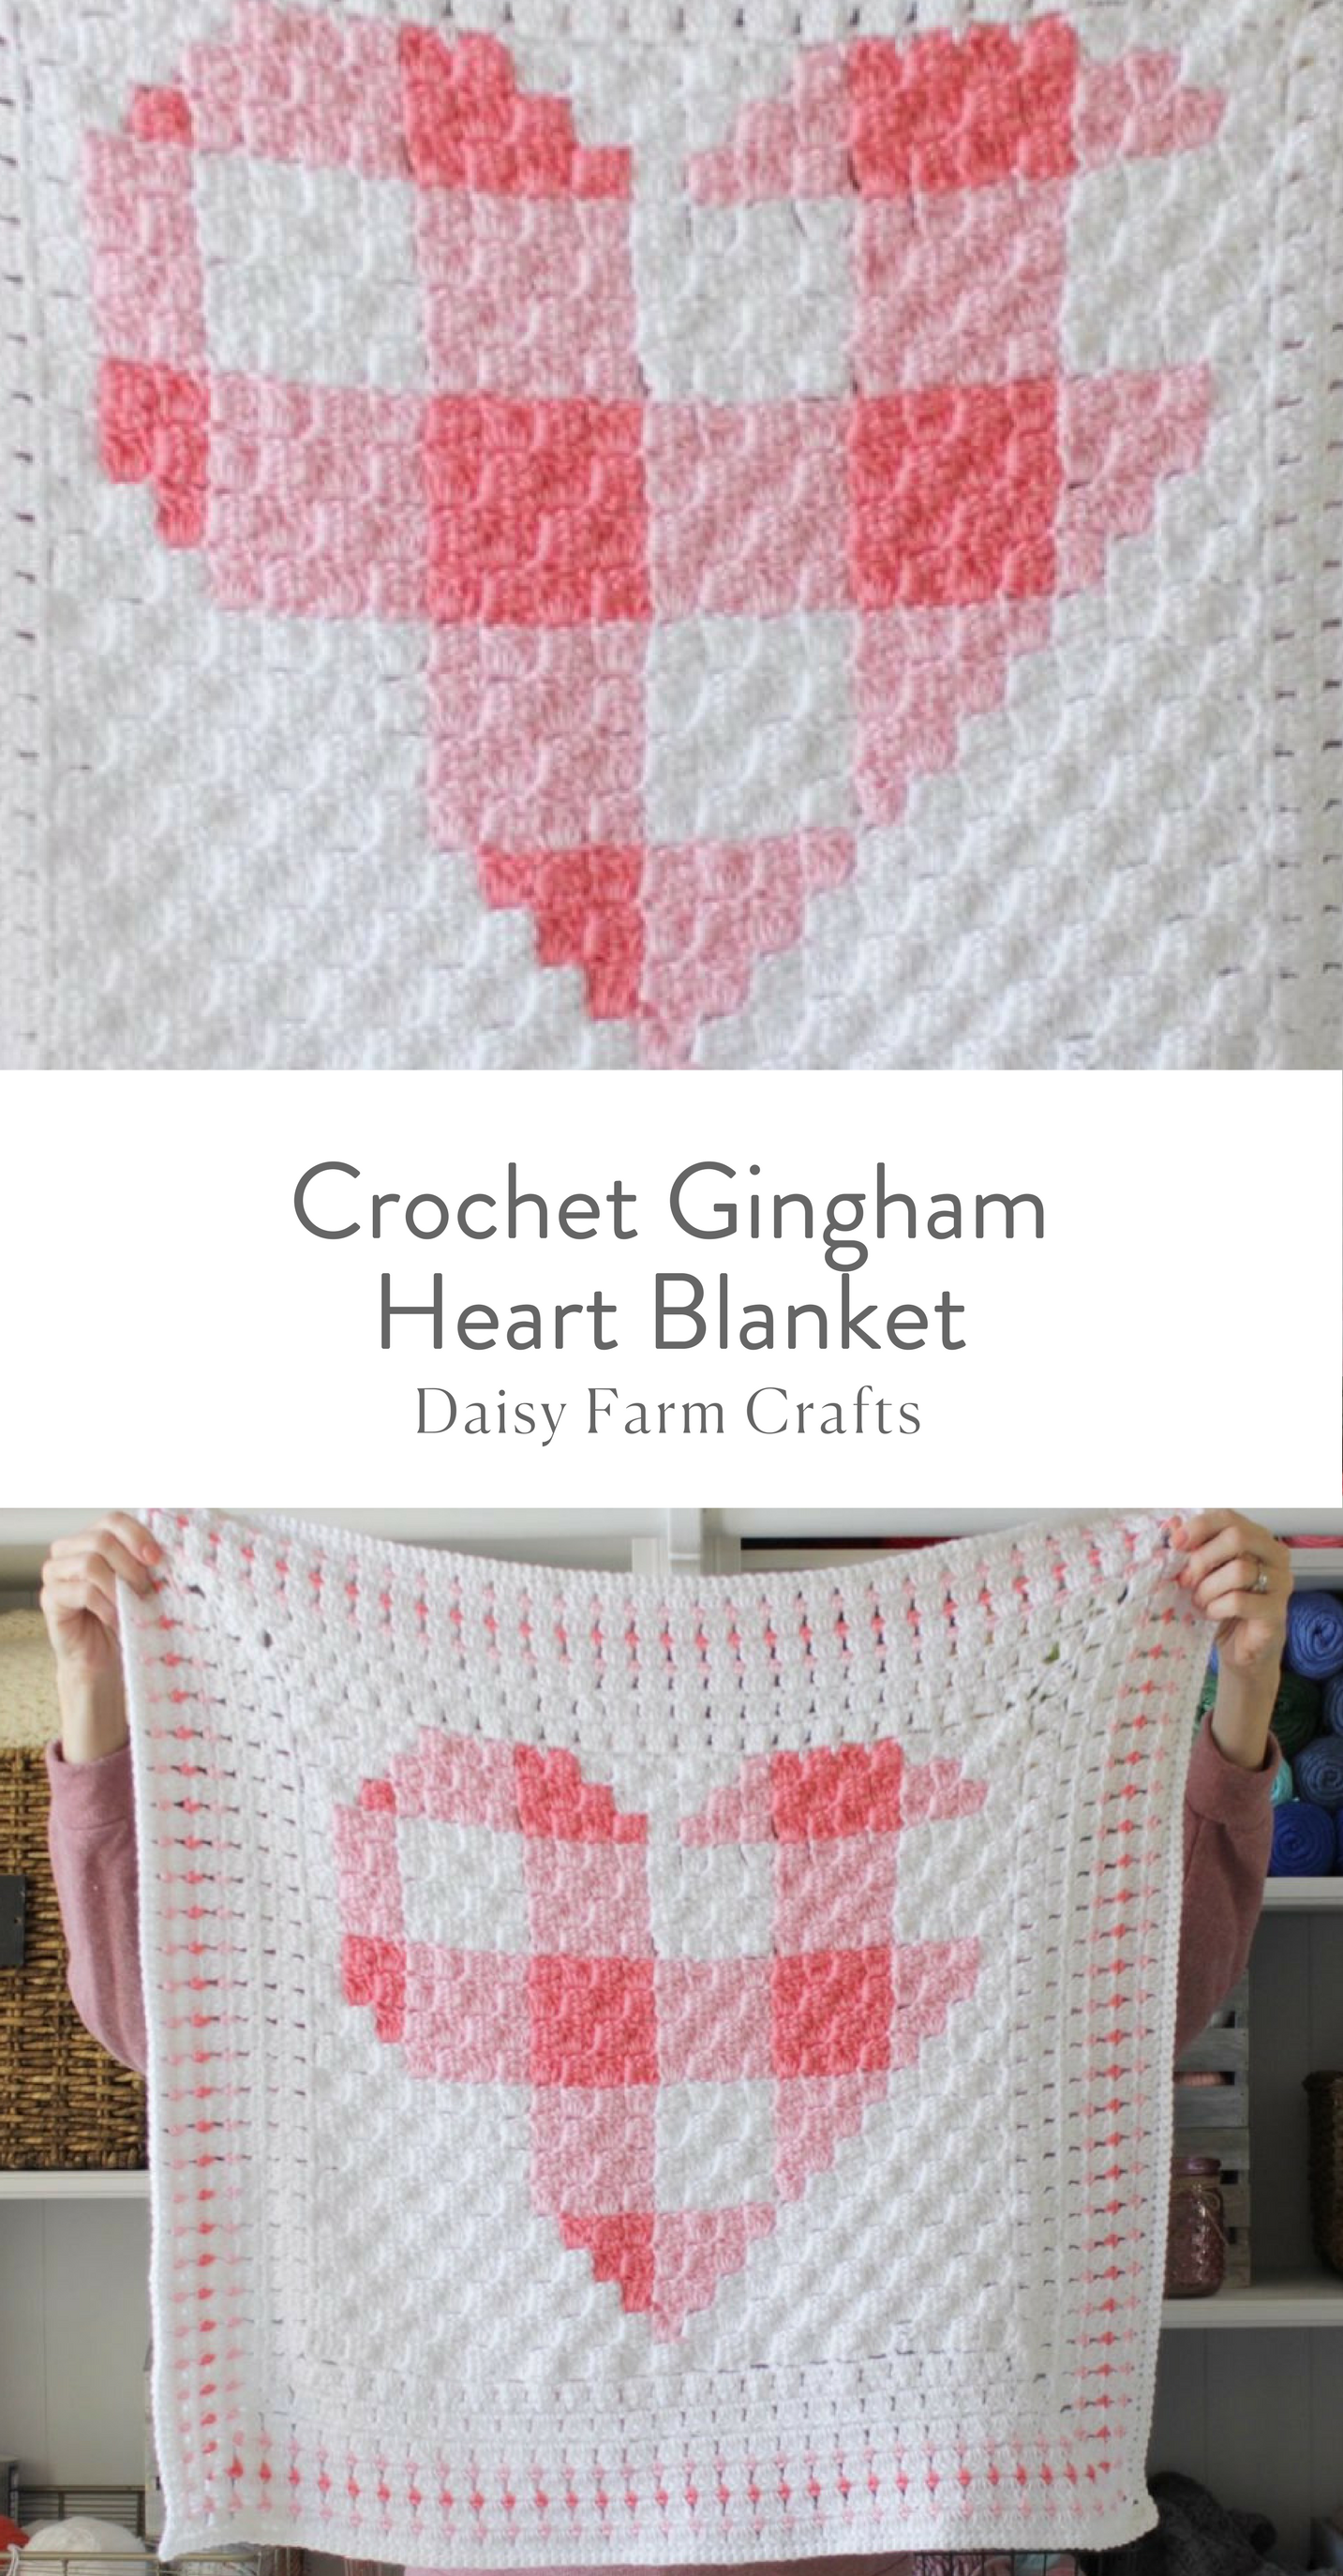 Free Pattern - Crochet Gingham Heart Blanket | técnica c2 c crochet ...